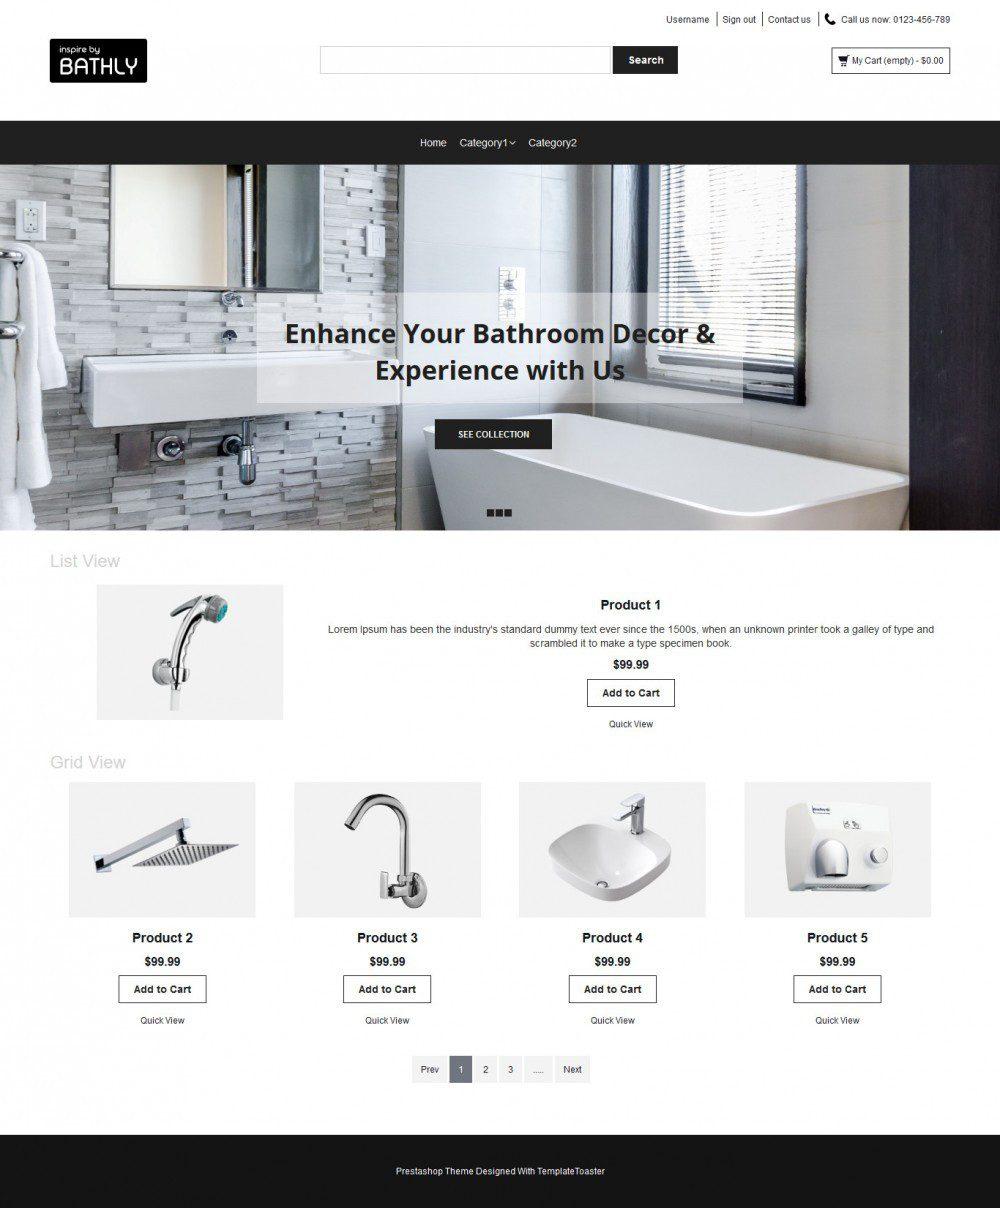 Bathly Bathroom Accessories Virtuemart Template